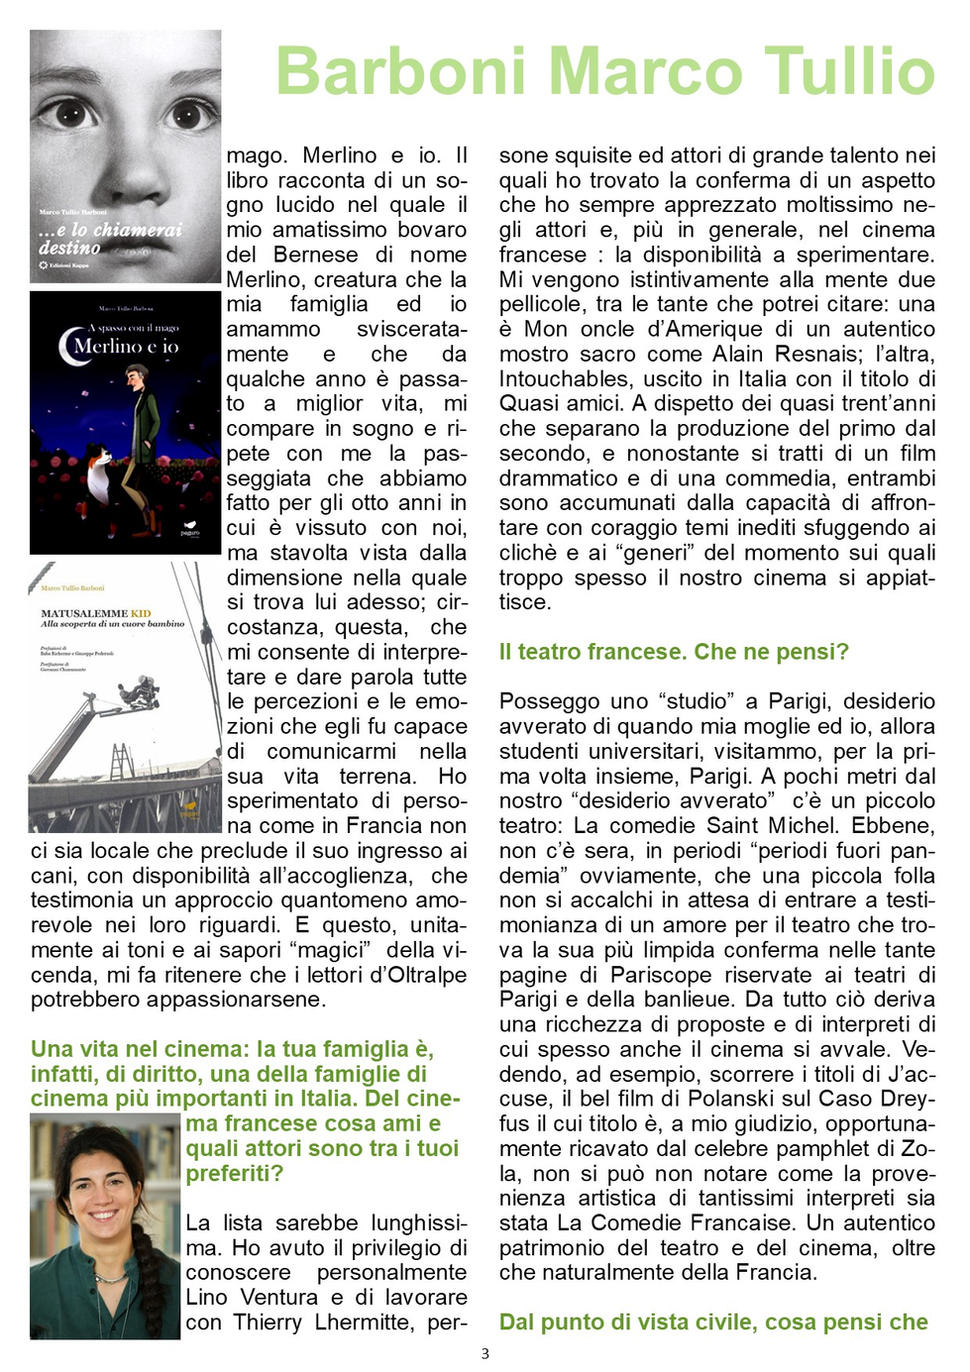 2 art Barboni 3Marco Tullio 13052021.jpg